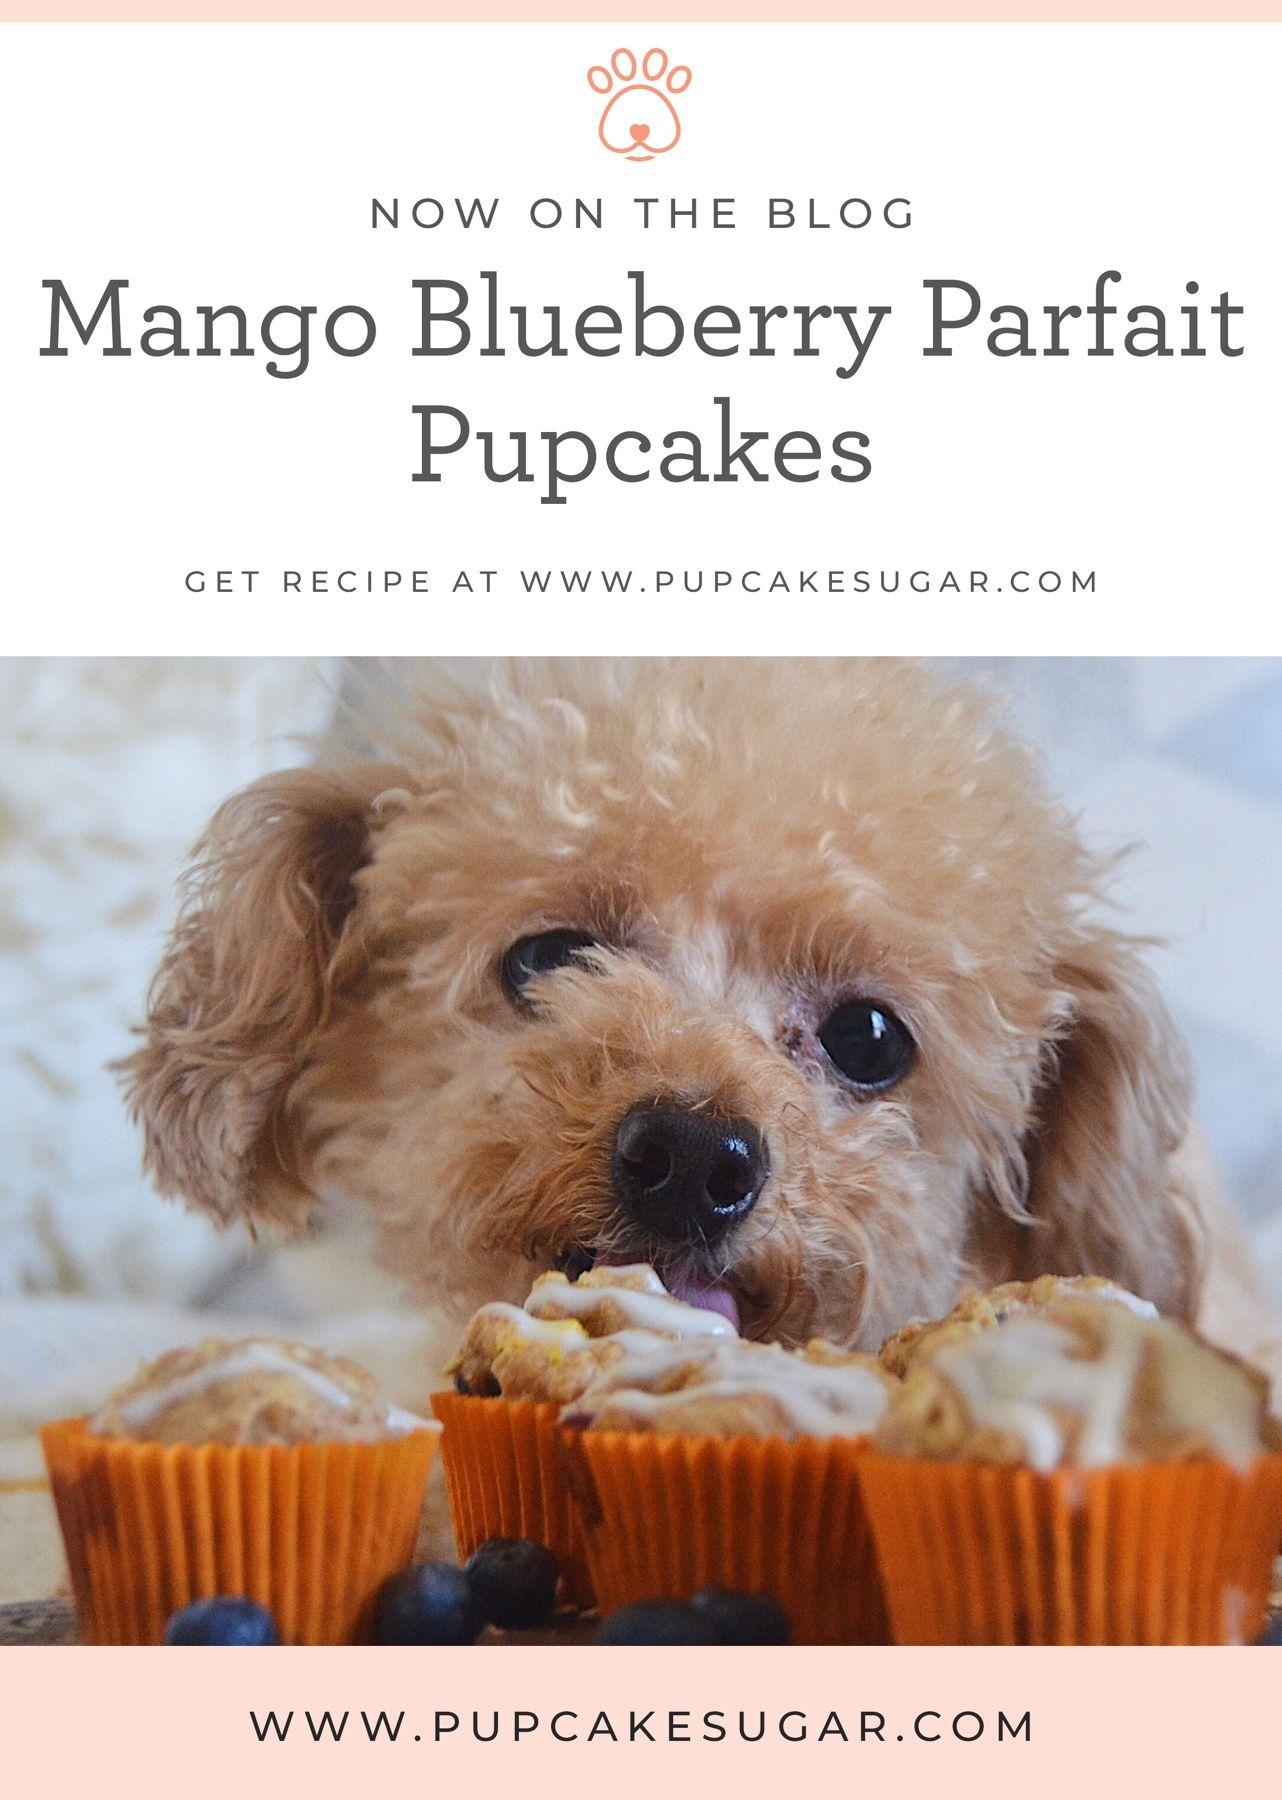 Sugar Catches Spring Fever Celebrates With These Mango Blueberry Parfait Pupcakes Diy Dog Treats